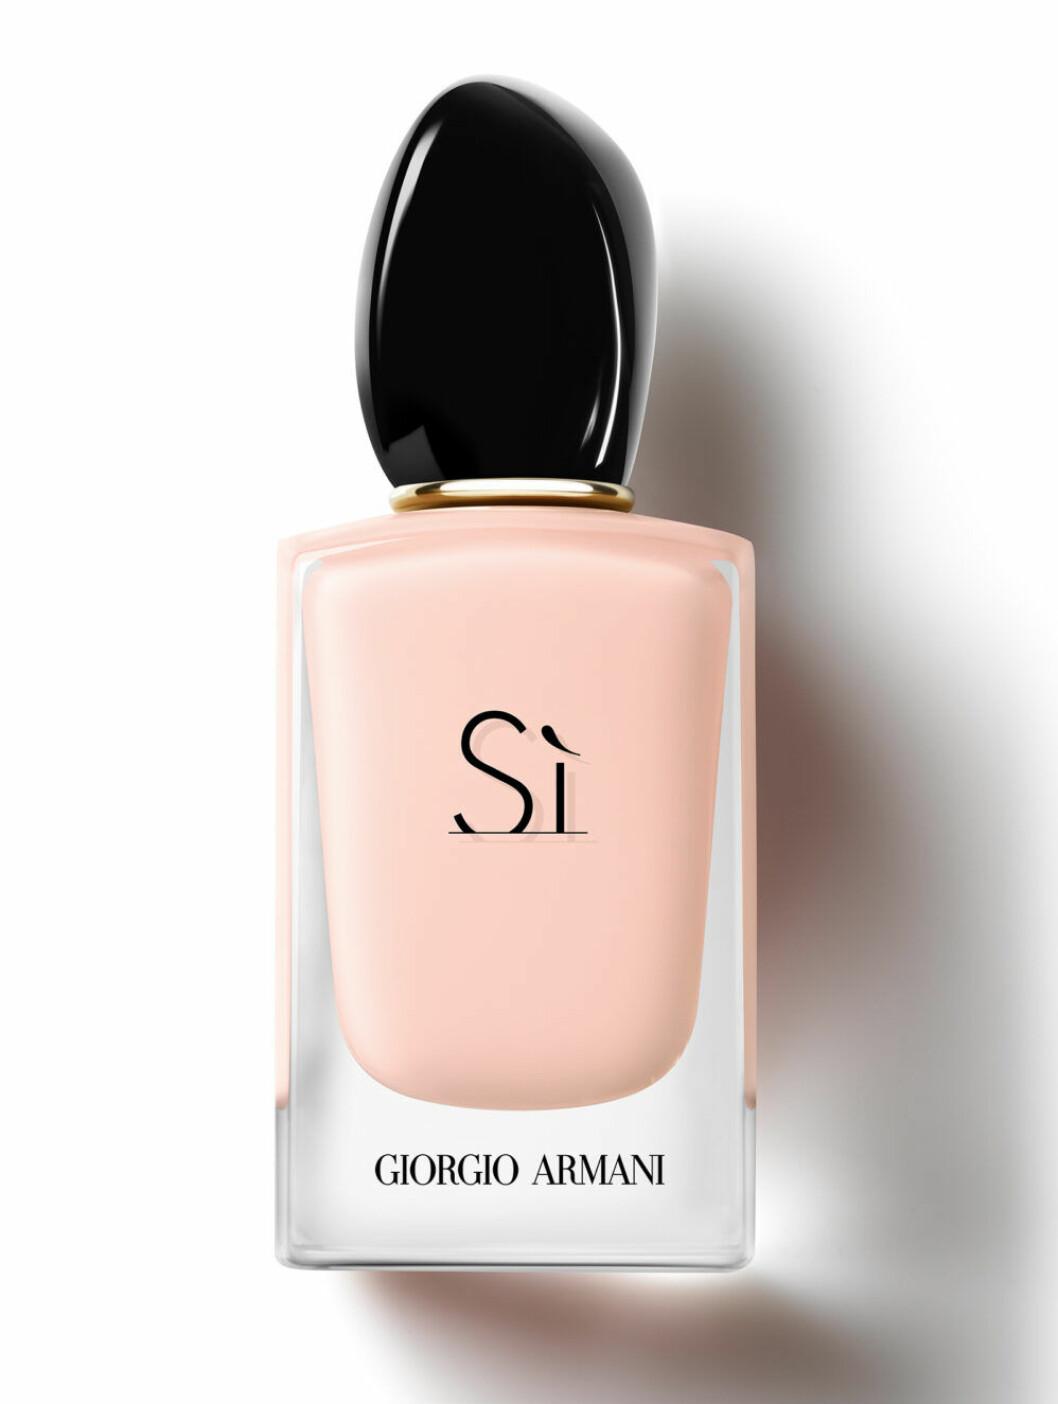 Armani parfym.